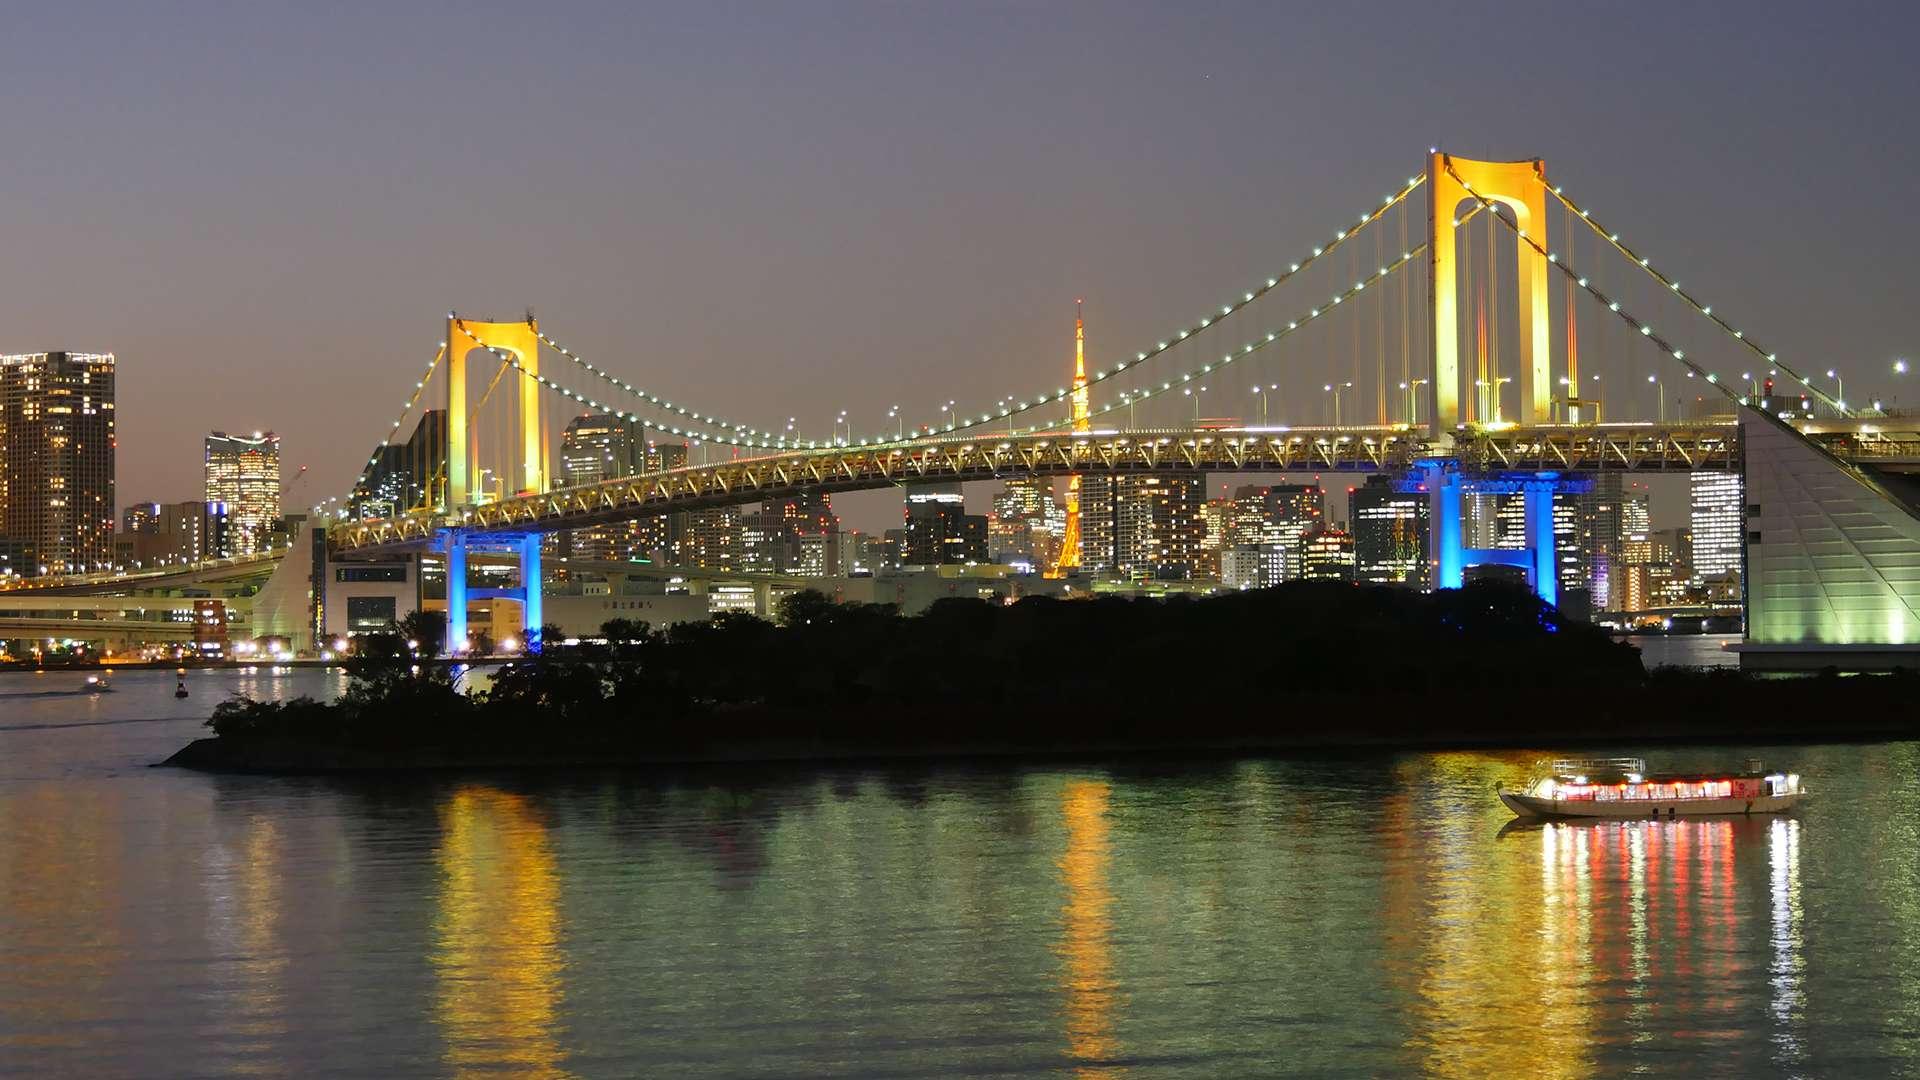 夕景(Tokyo Twilight)【HealingBlue】